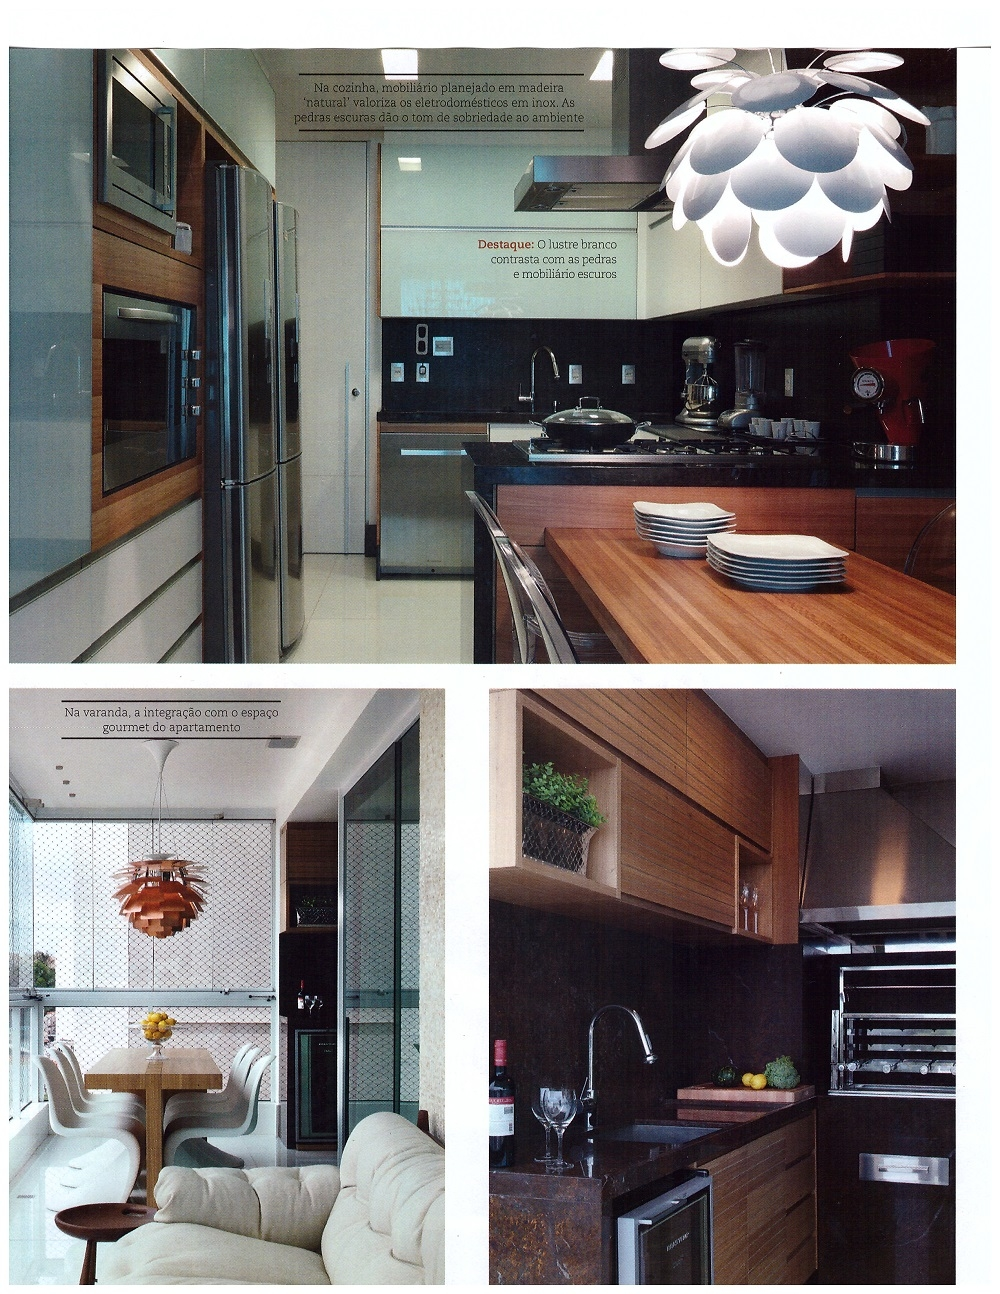 casa-projetoestilo-n36-vivian-coser-9-20160226121224.jpg